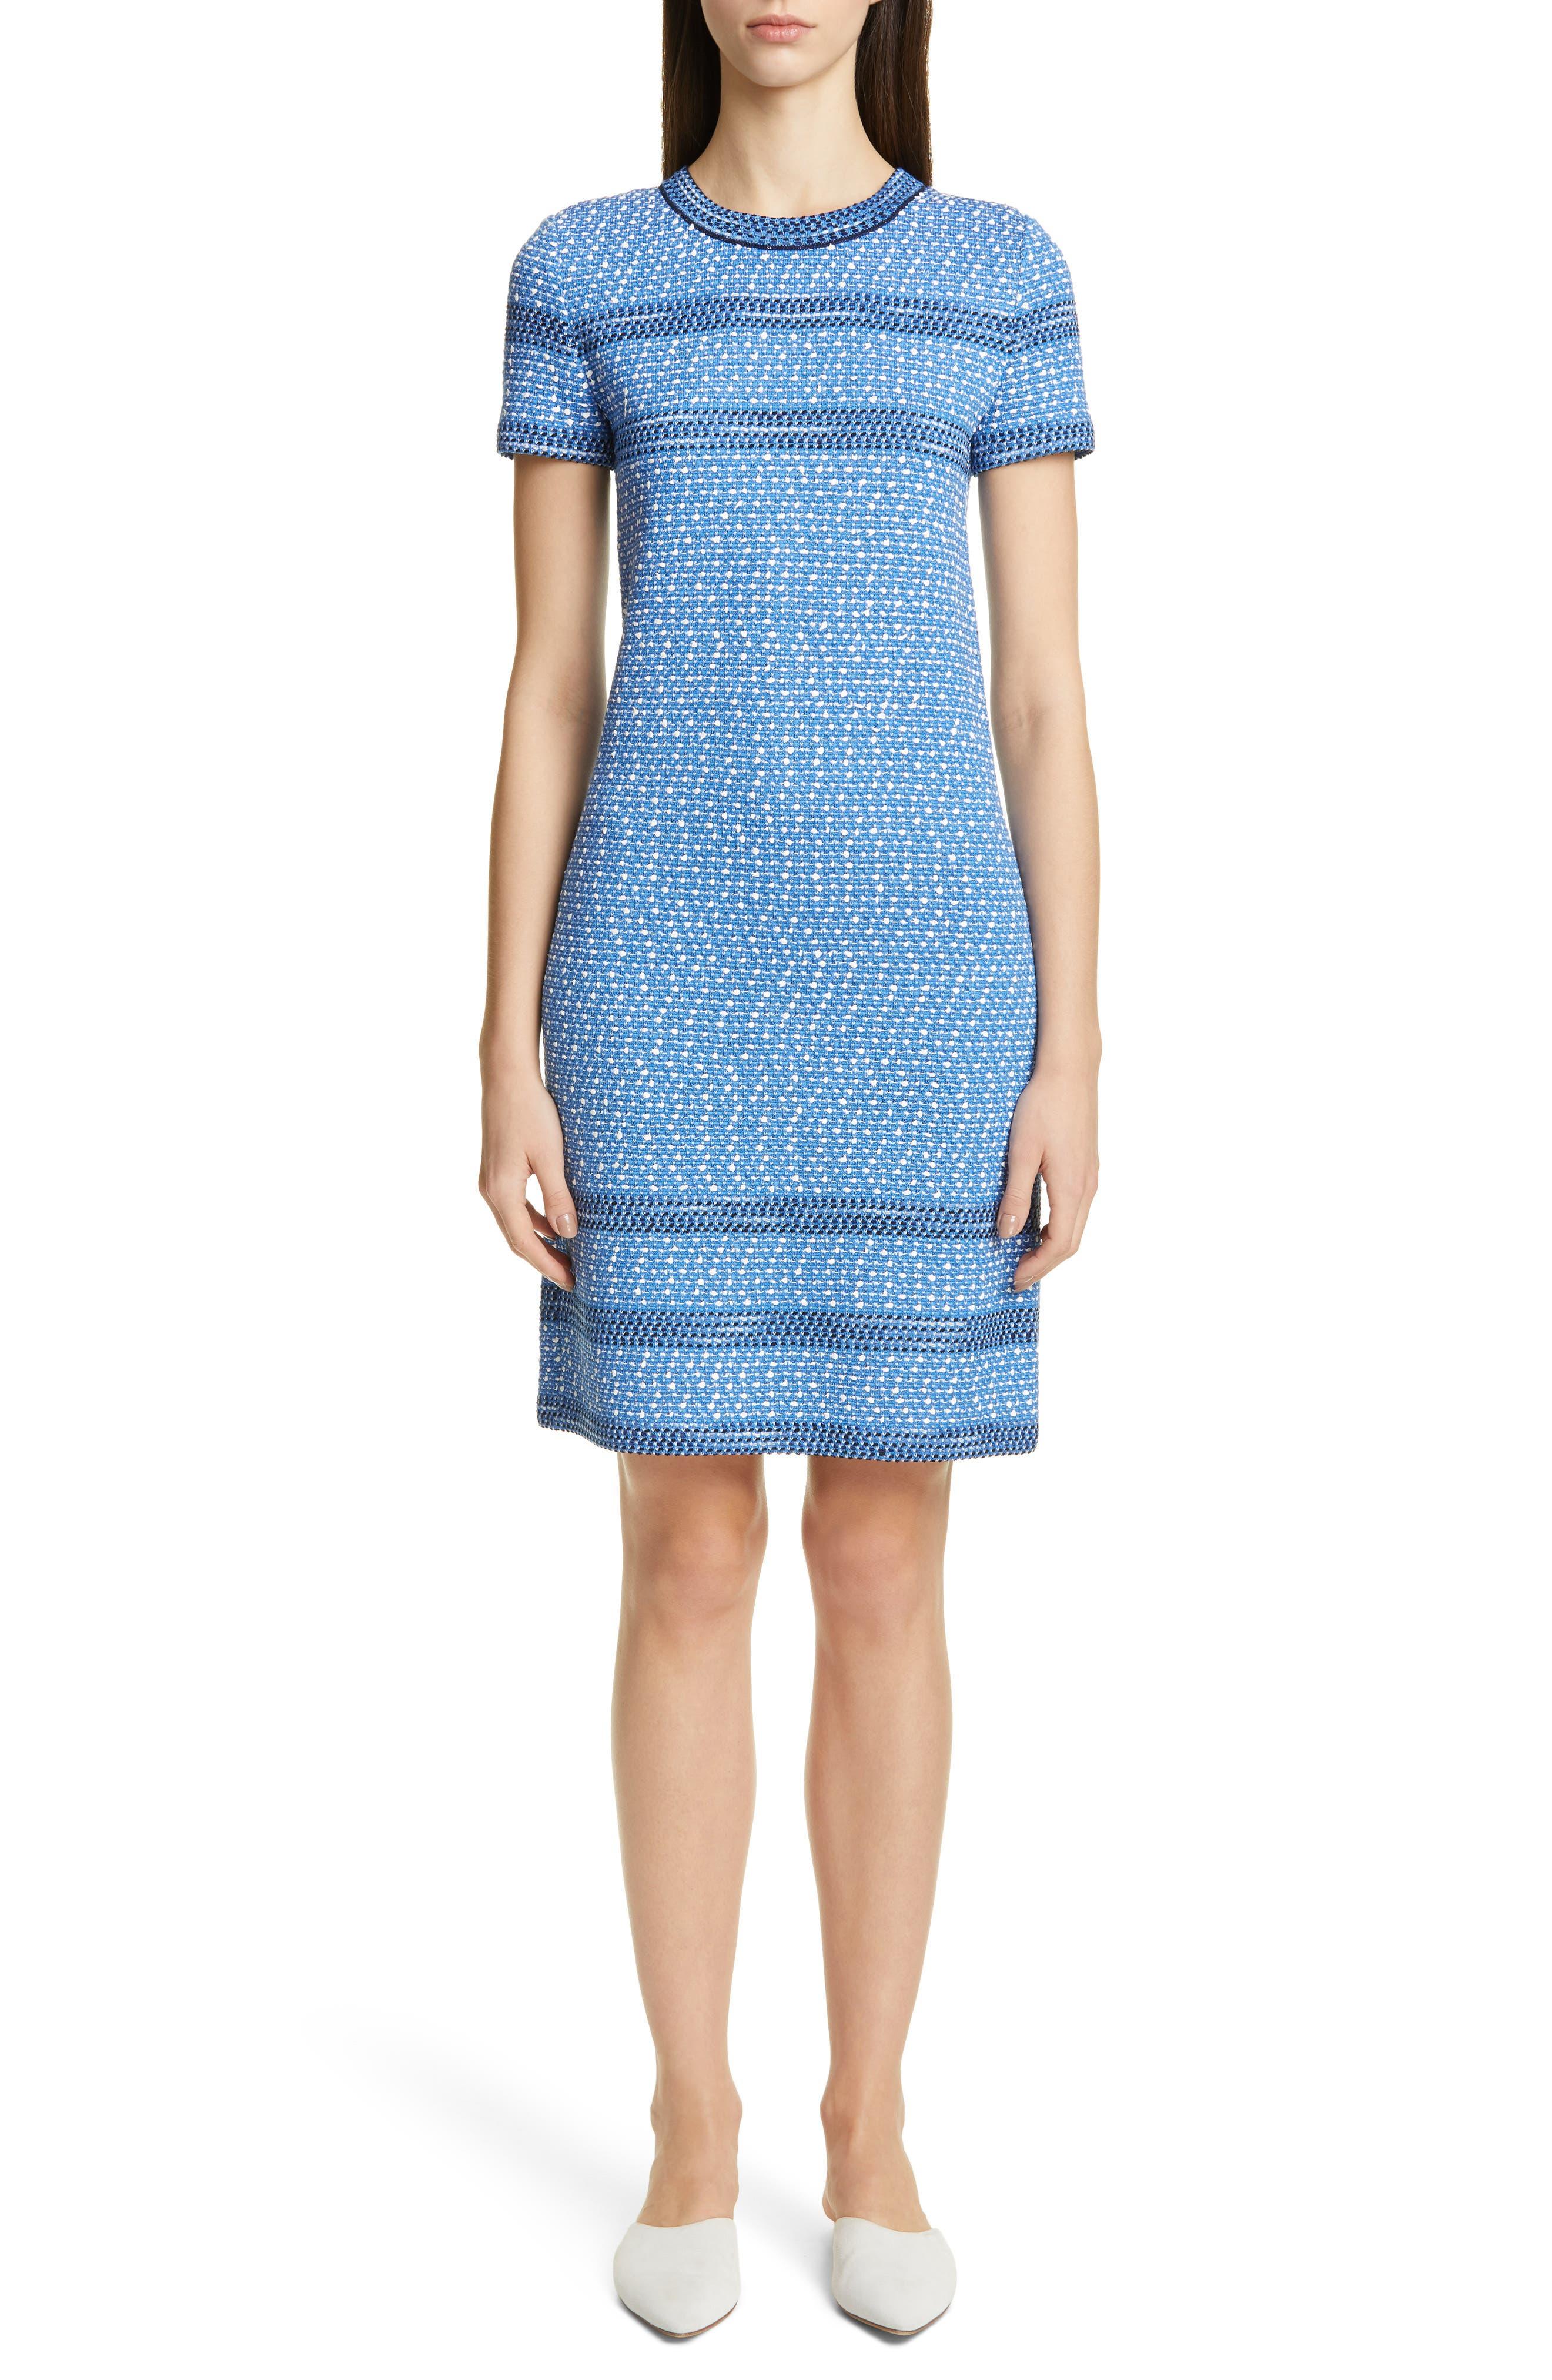 St. John Collection Engineered Coastal Texture Tweed Knit Dress, White